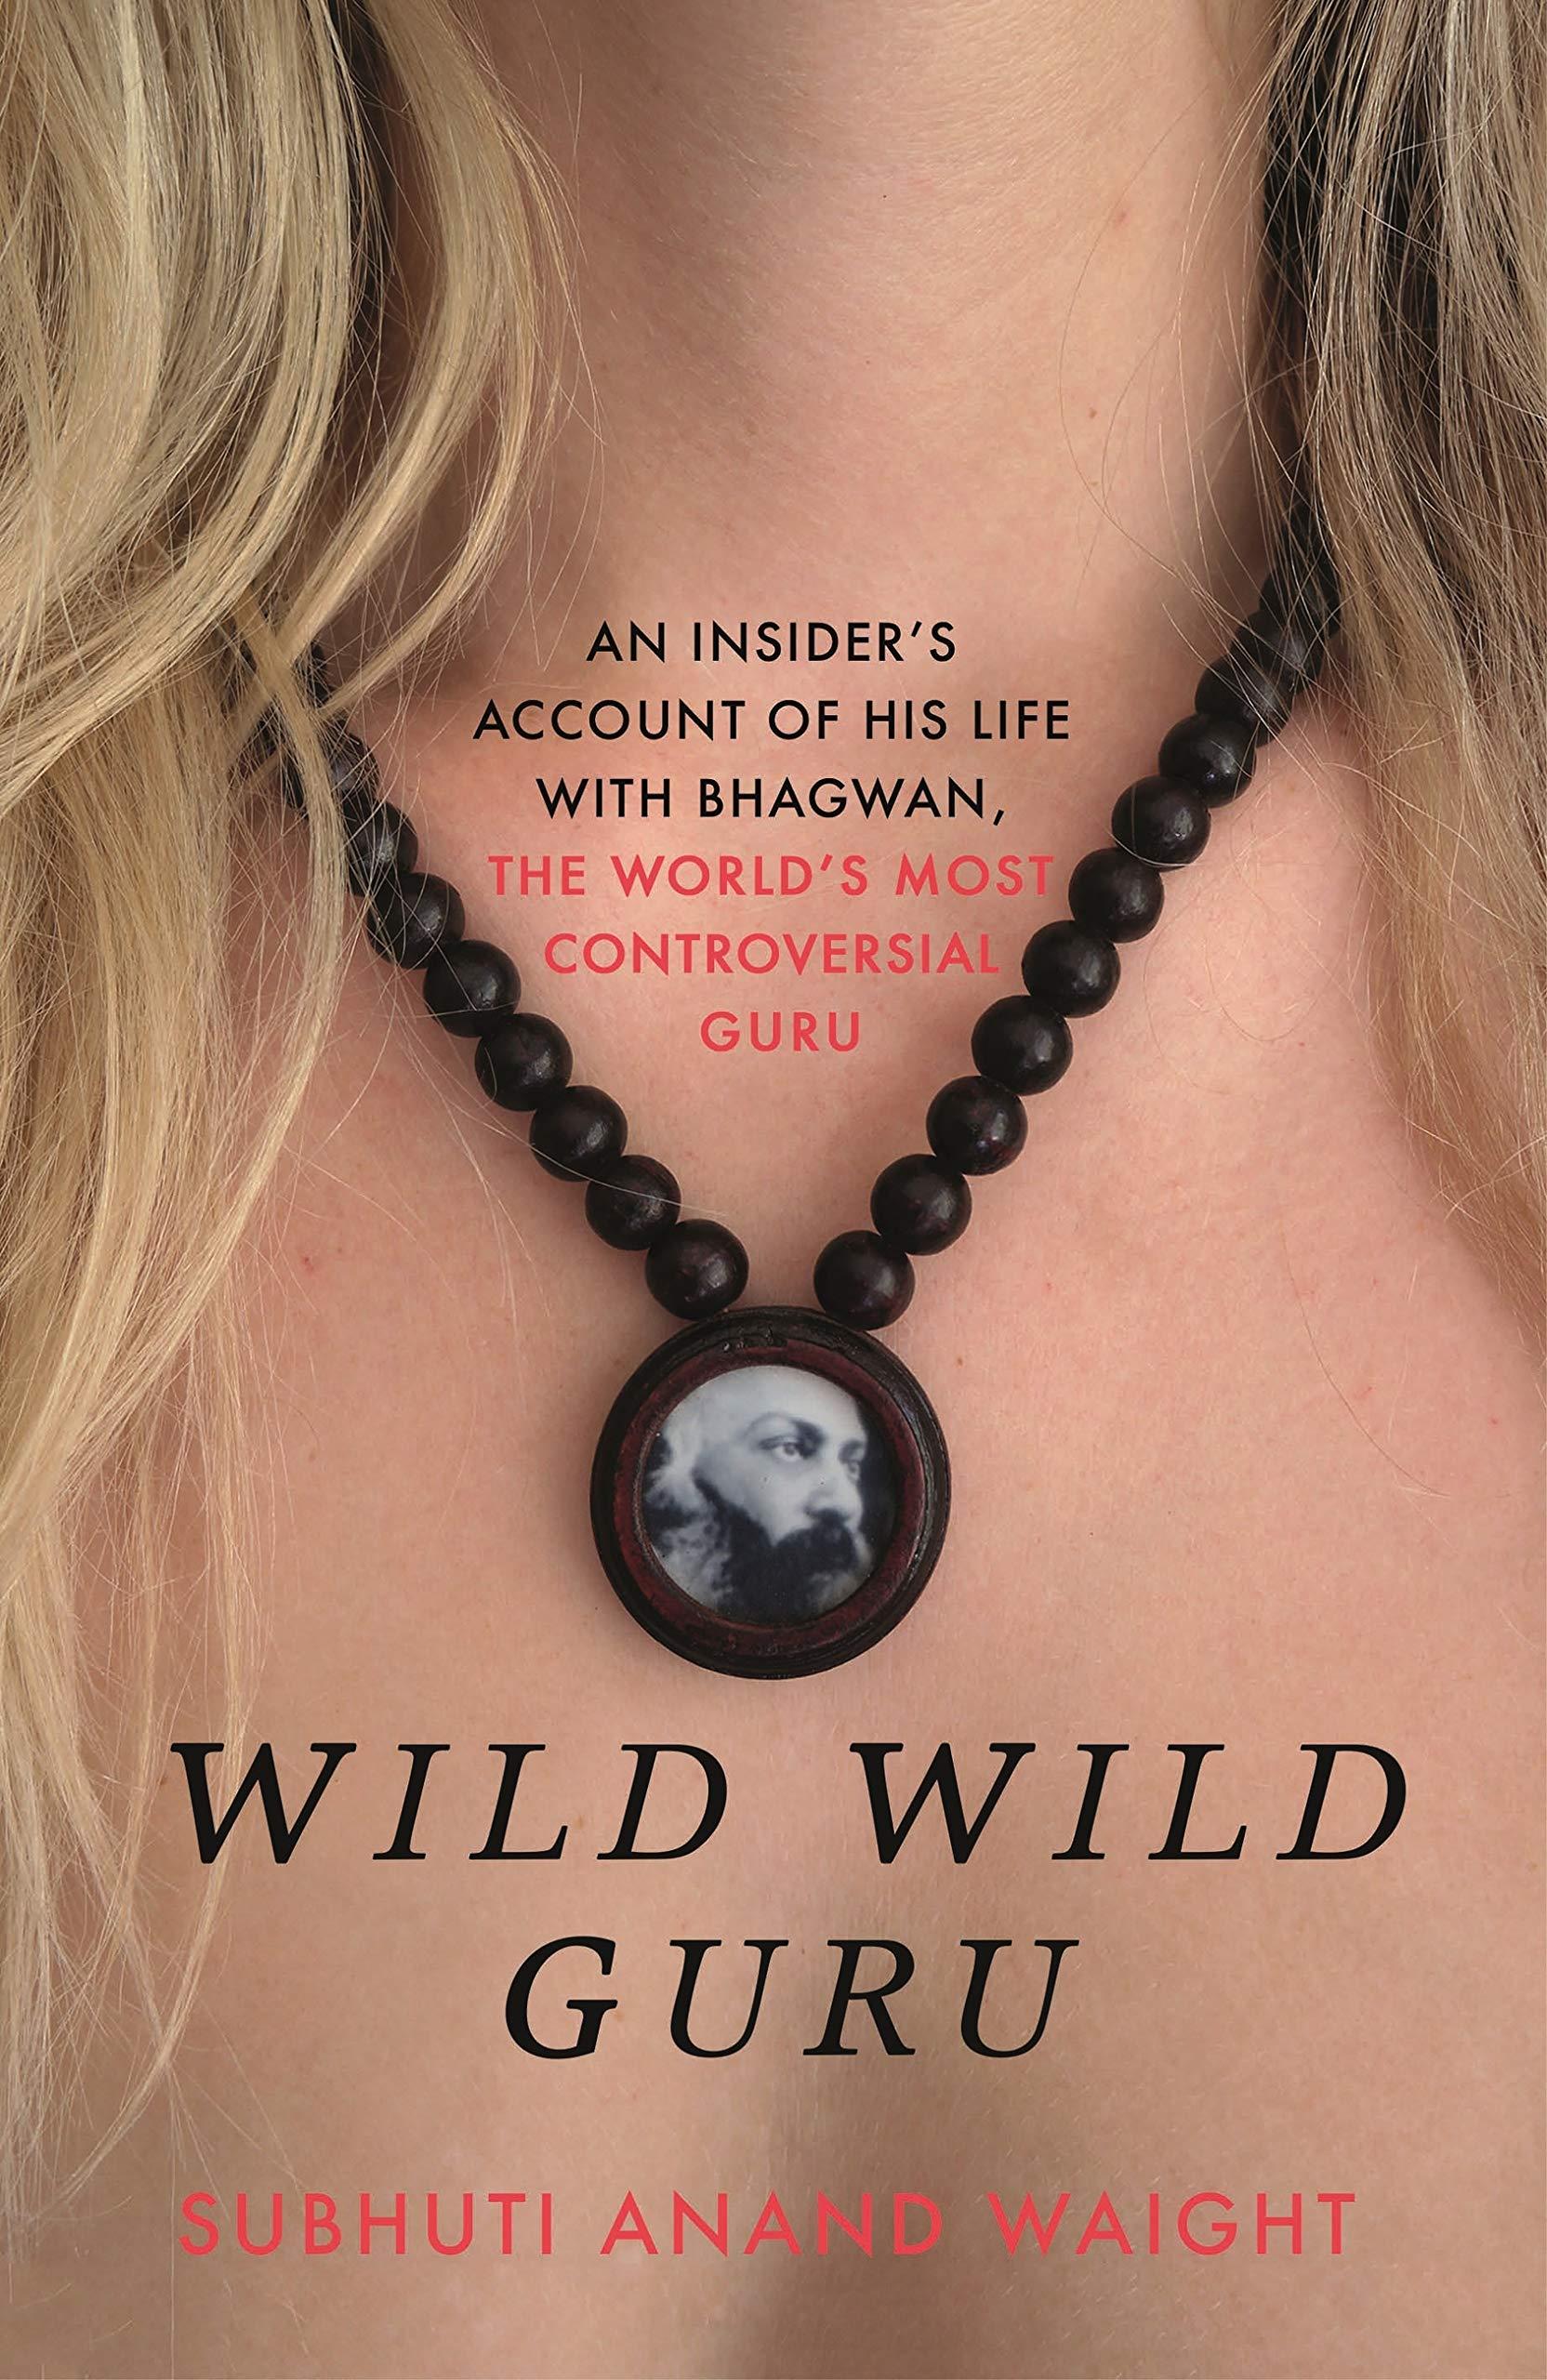 Wild Wild Guru  An Insider's Account Of His Life With Bhagwan The World's Most Controversial Guru  English Edition